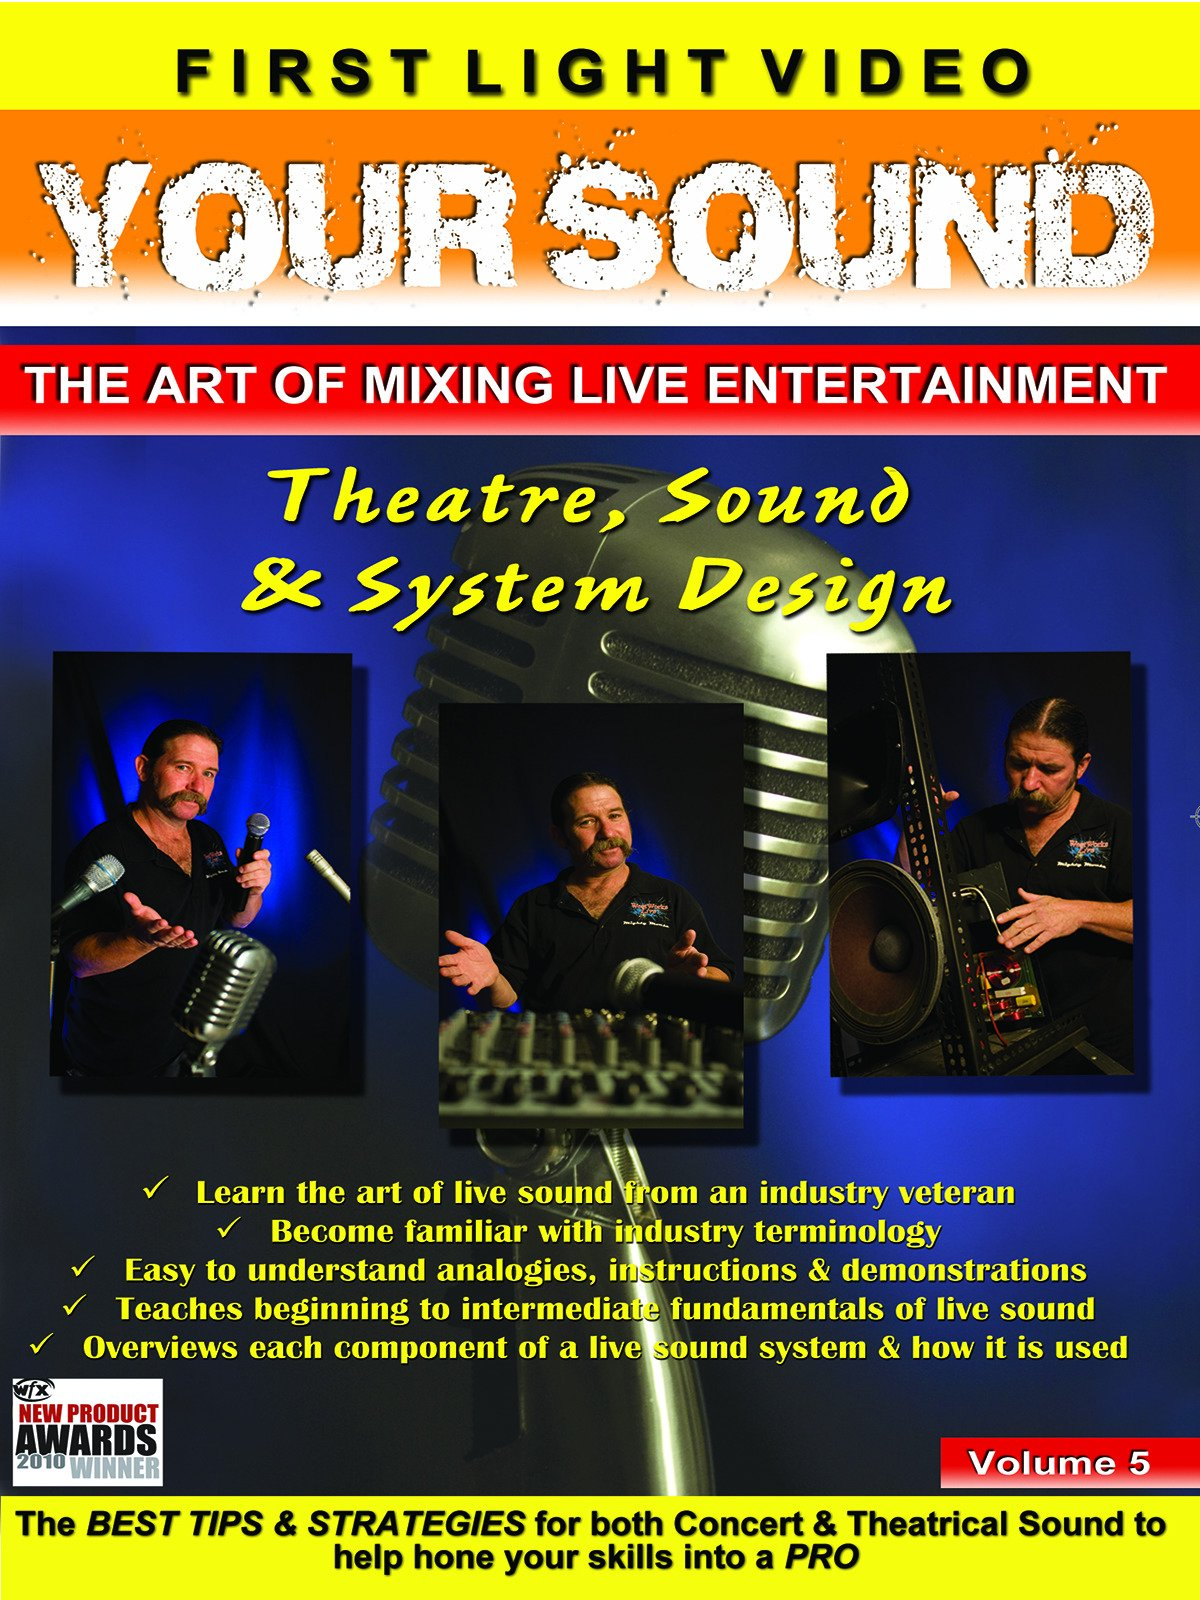 Theatre Sound & System